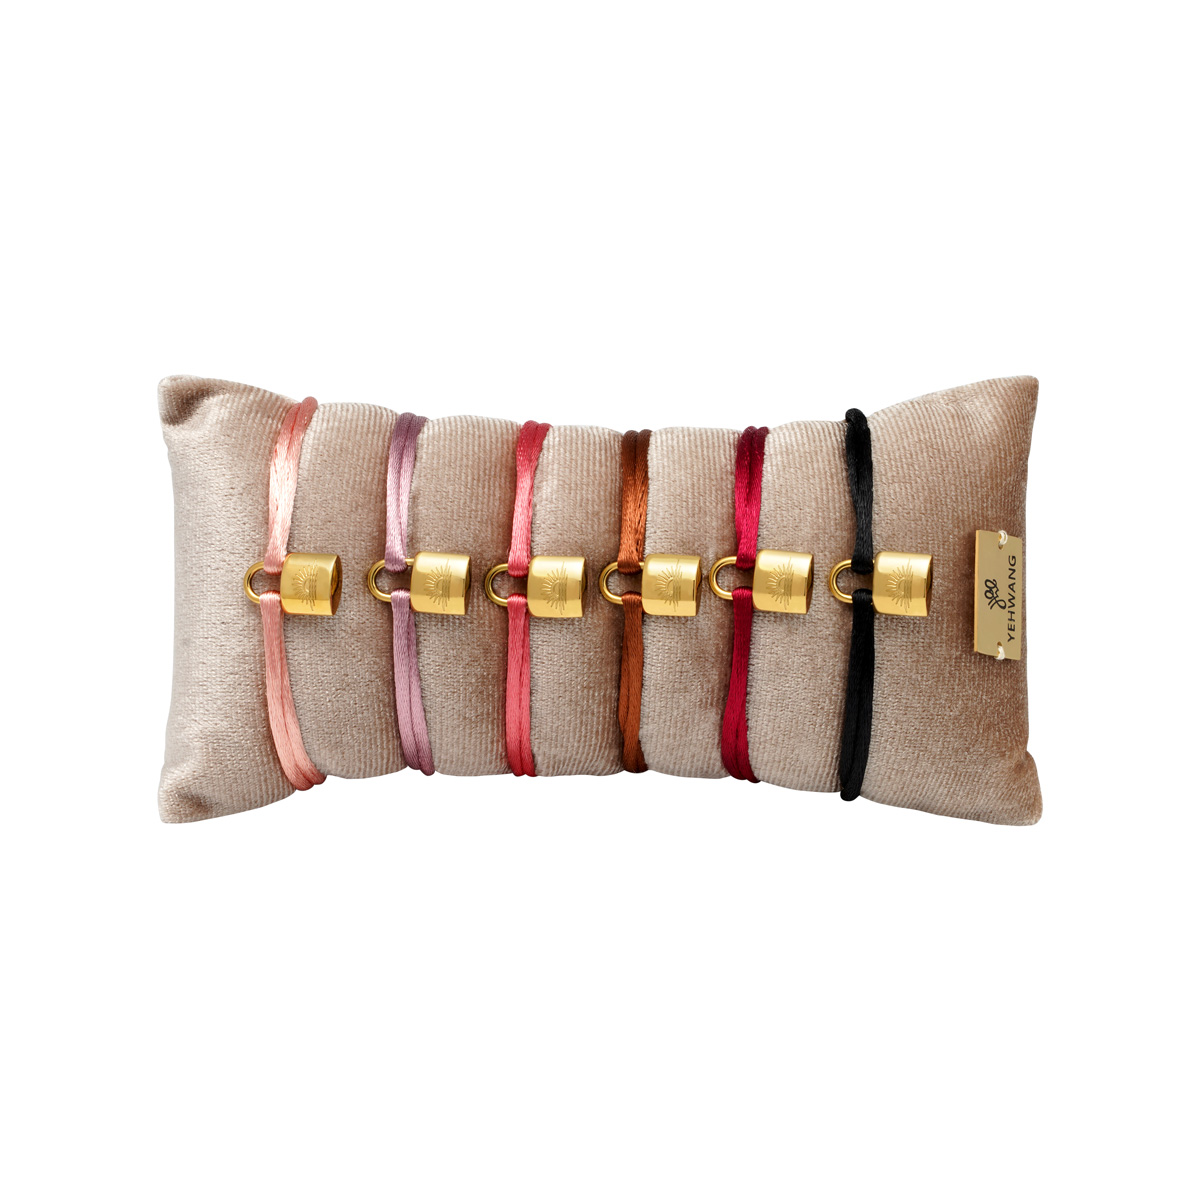 Armband-anzeigeset satin lock